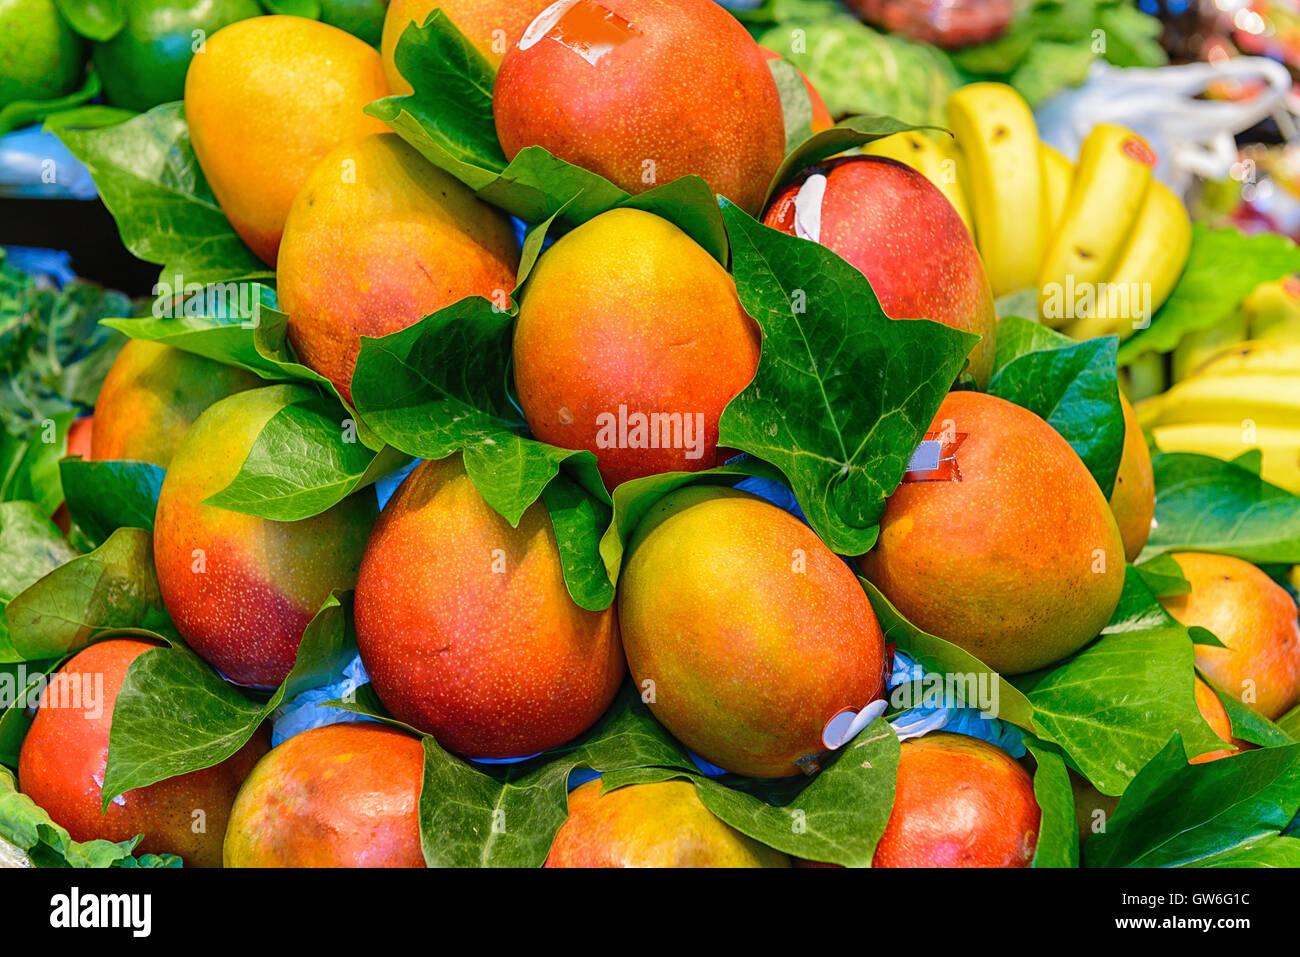 Mango fruits at Boqueria market in Barcelona. - Stock Image